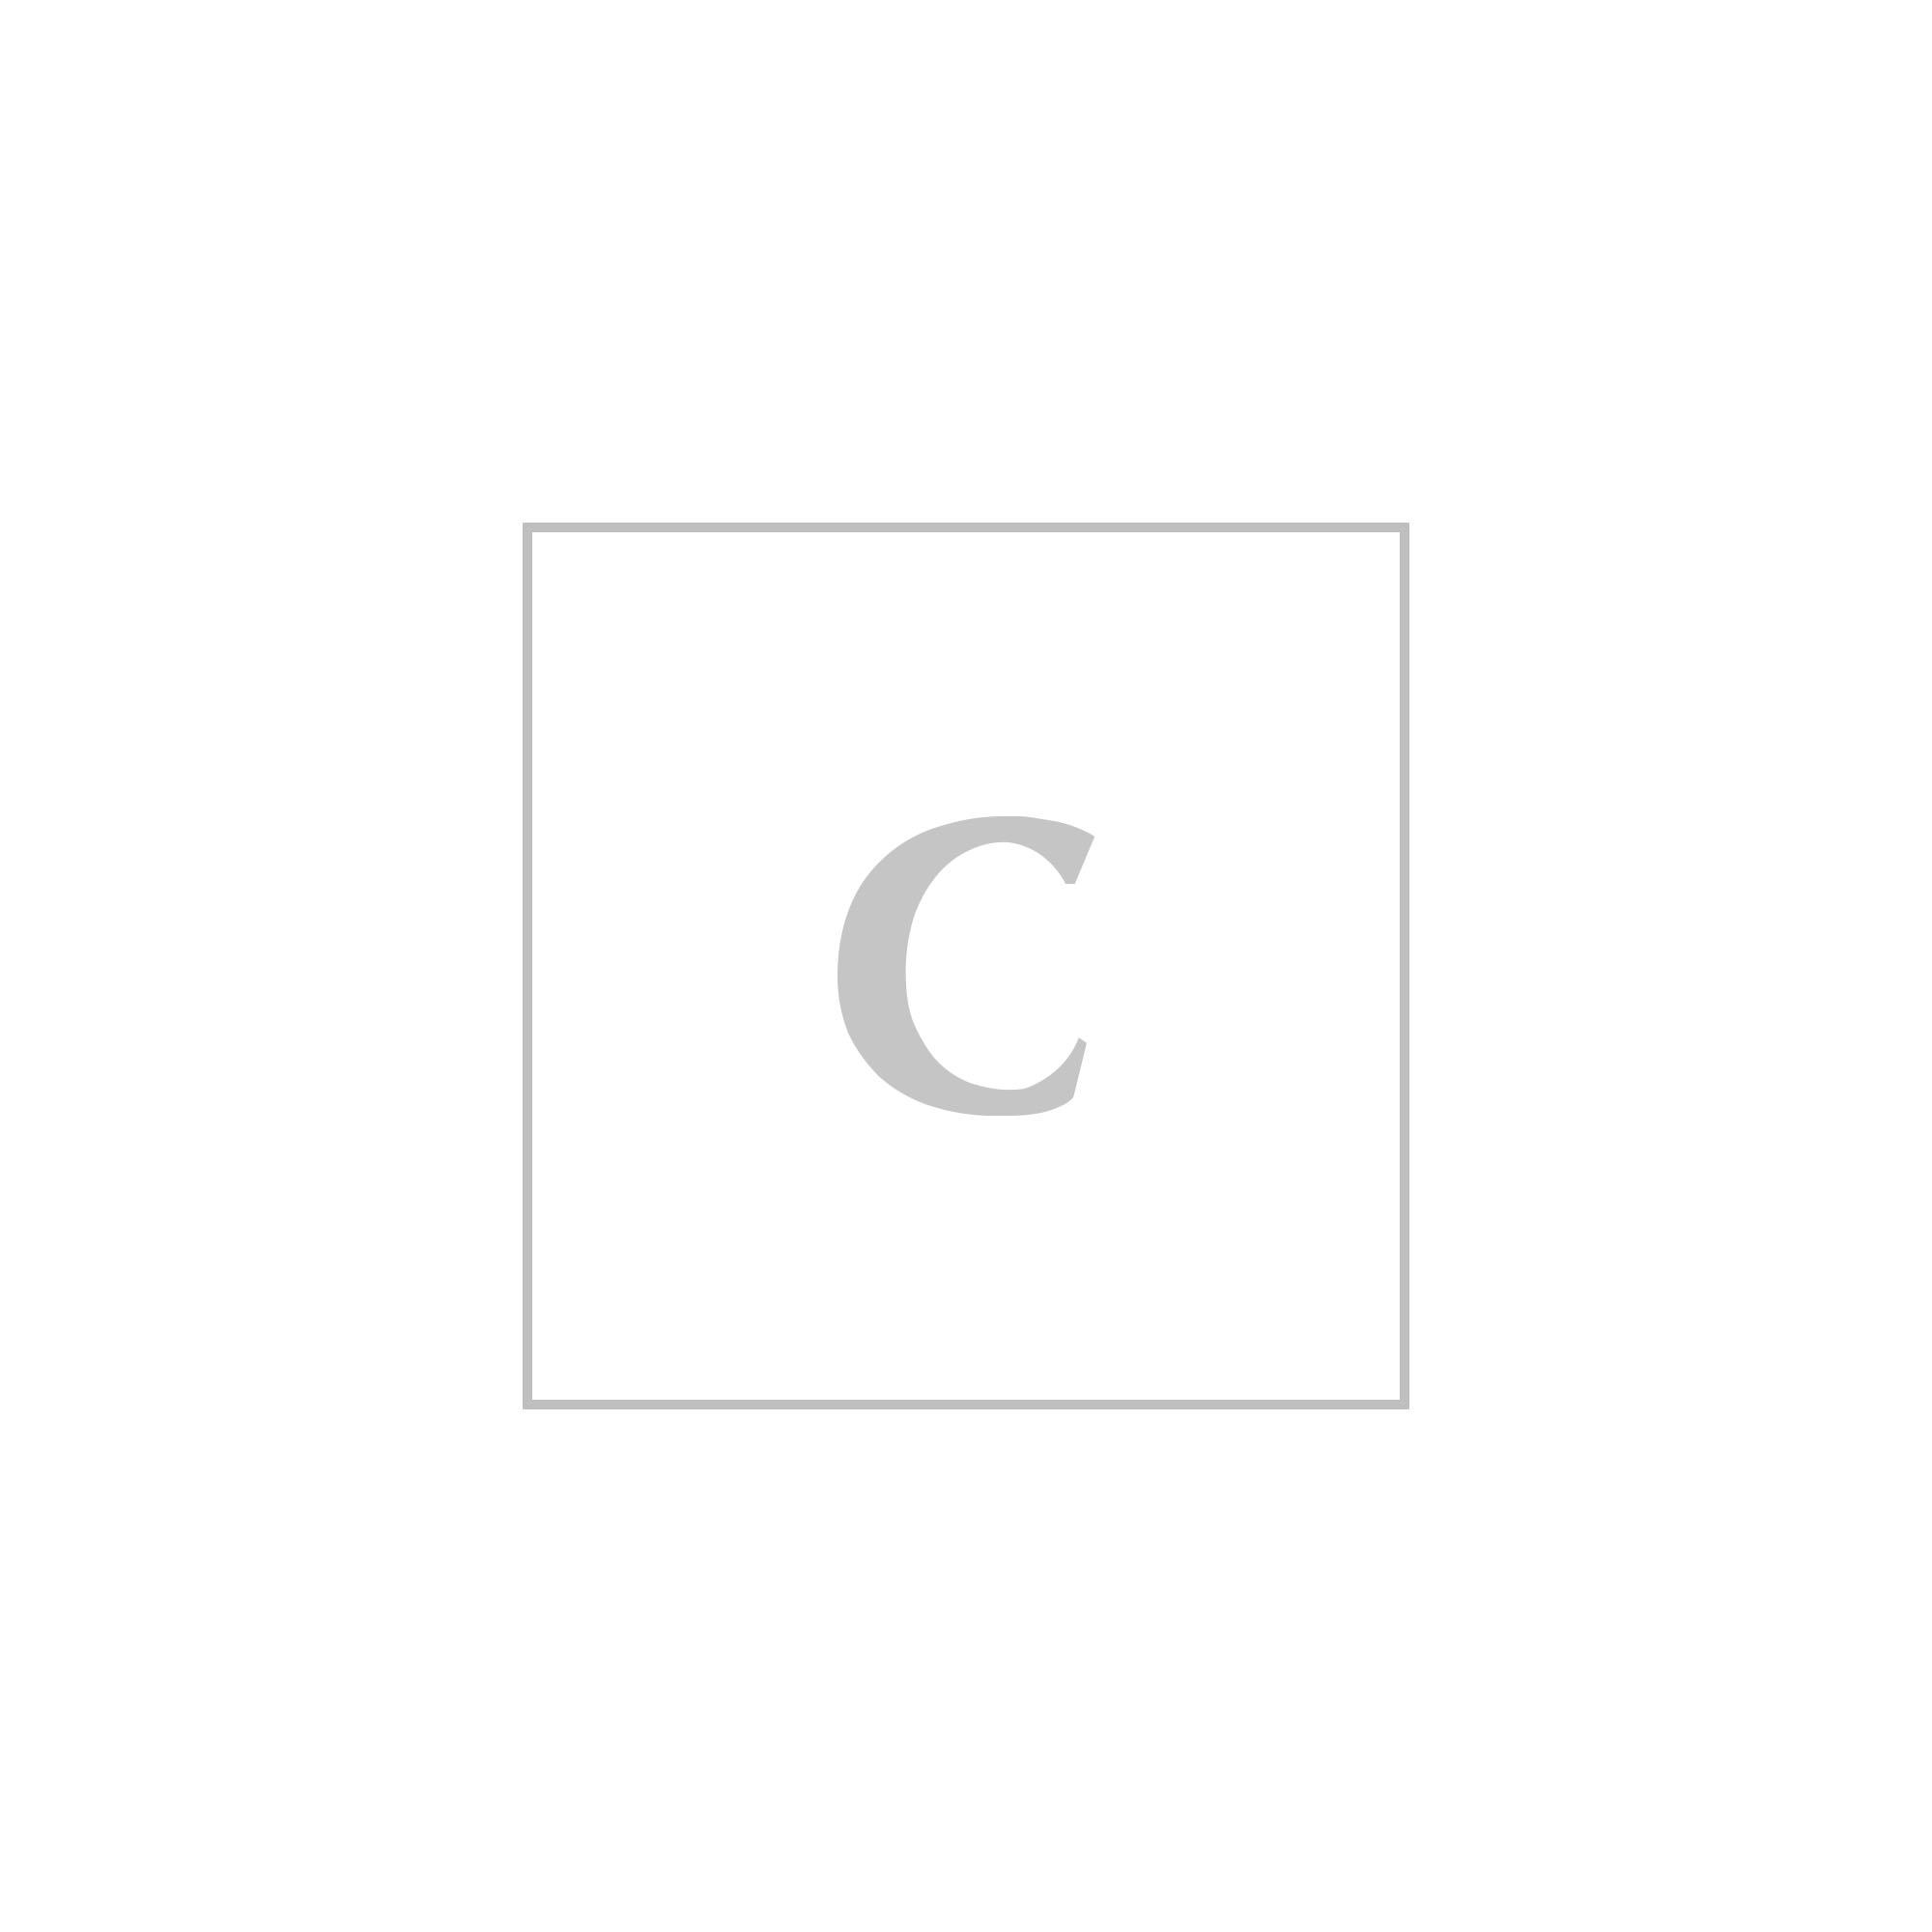 Dolce & gabbana zaino nylon corone e api dauphine